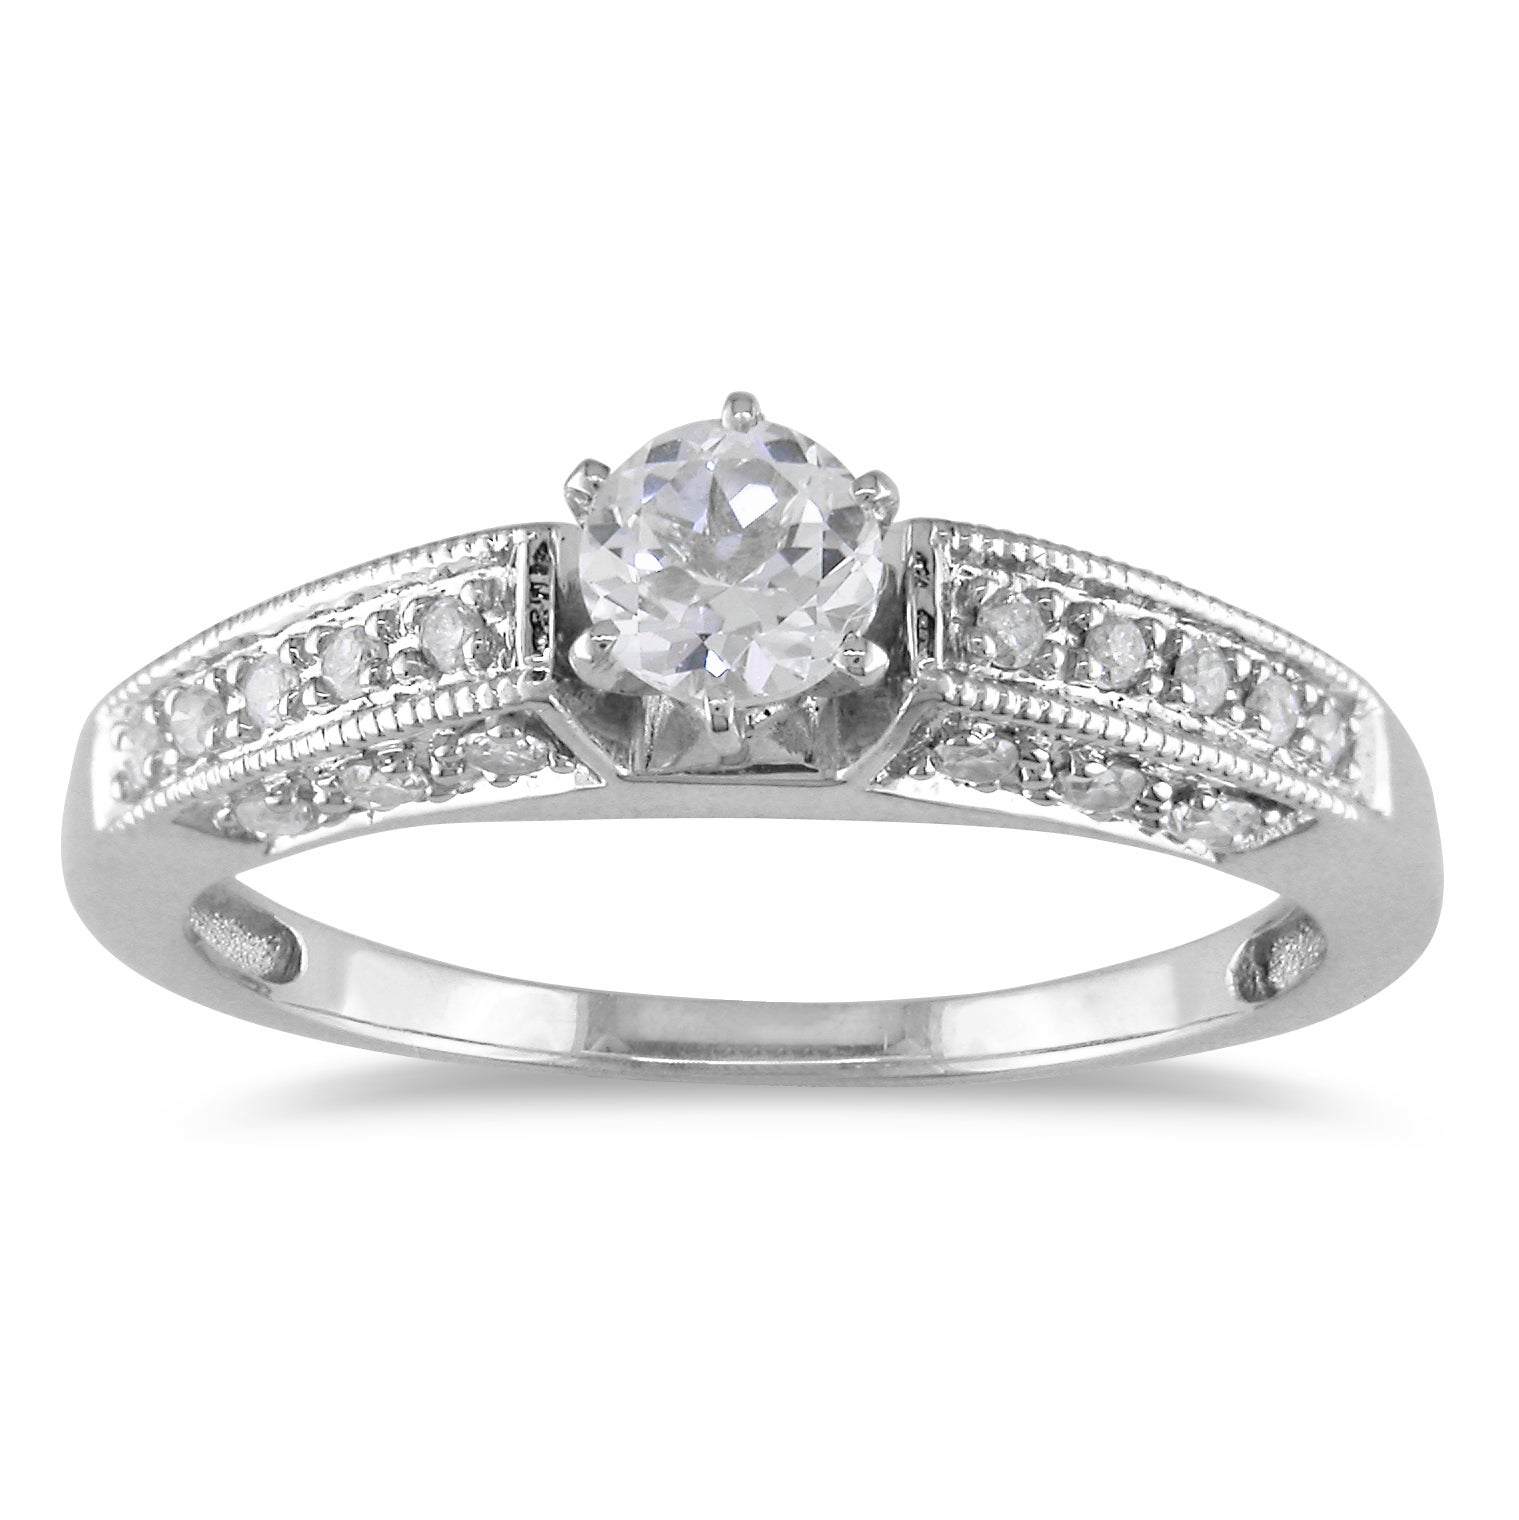 Miadora 14k Gold Created Sapphire and 1/4ct TDW Diamond Ring (G-H, I1-I2)